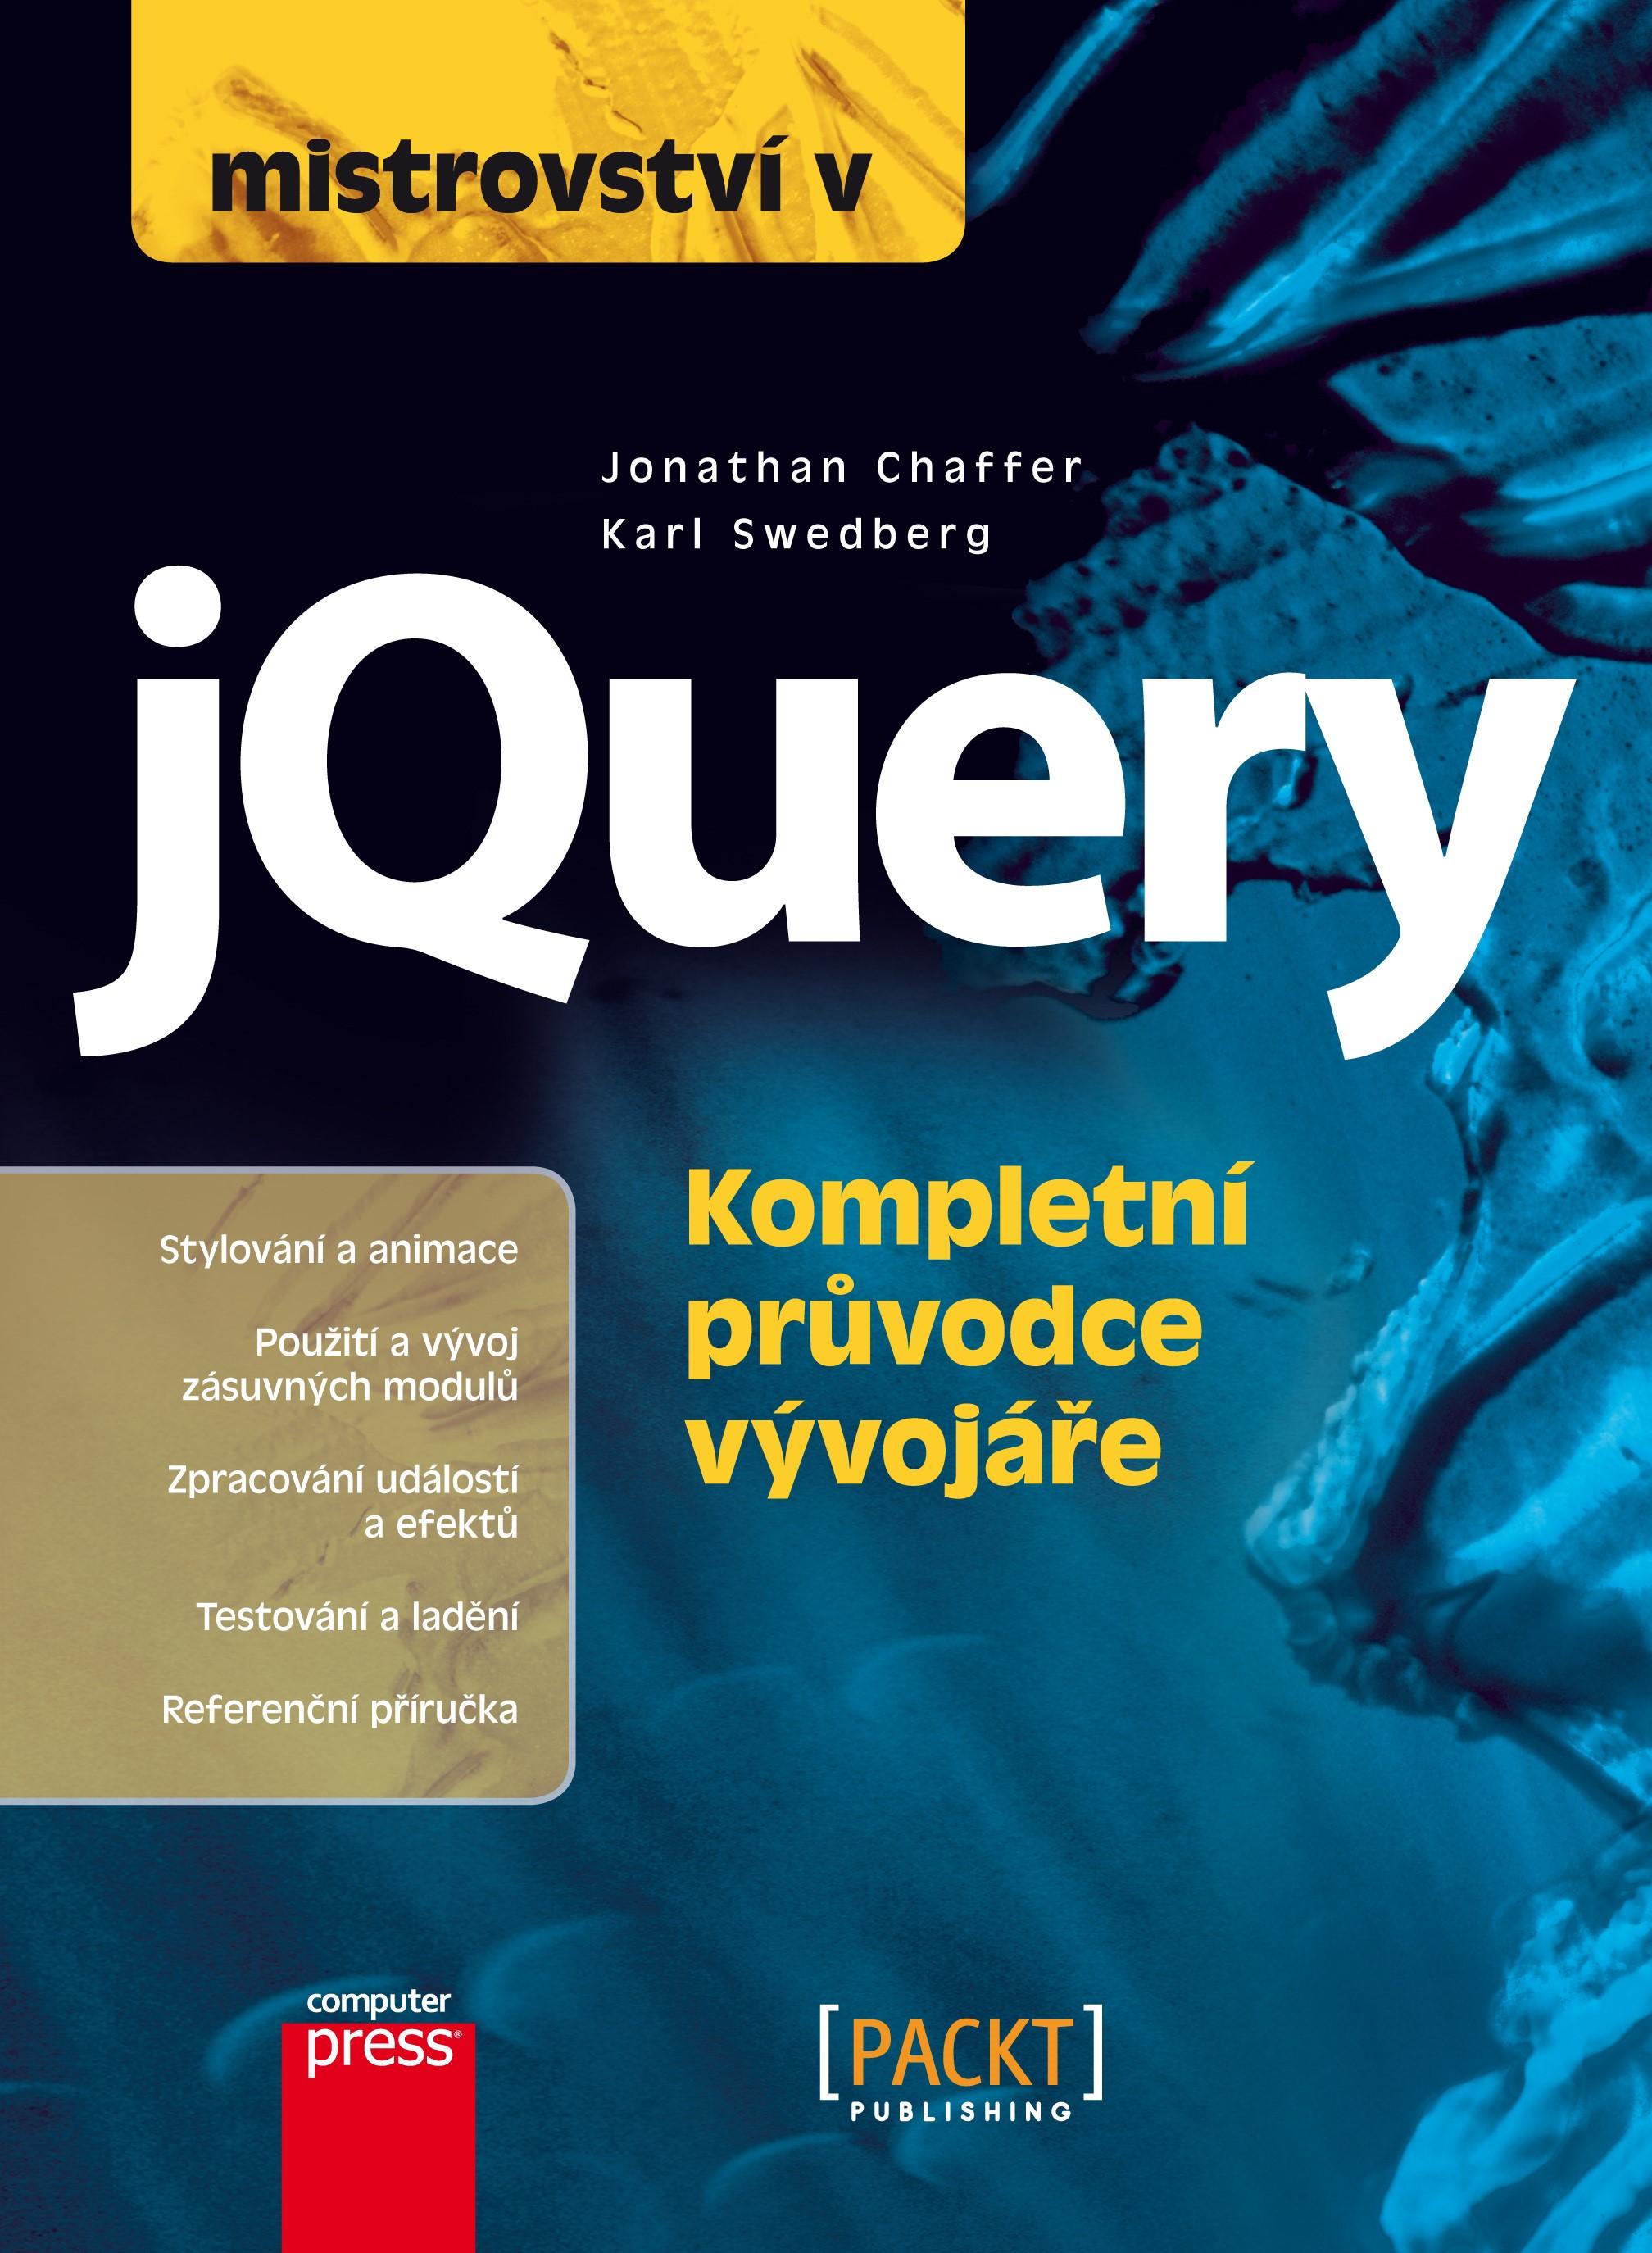 Mistrovství v jQuery